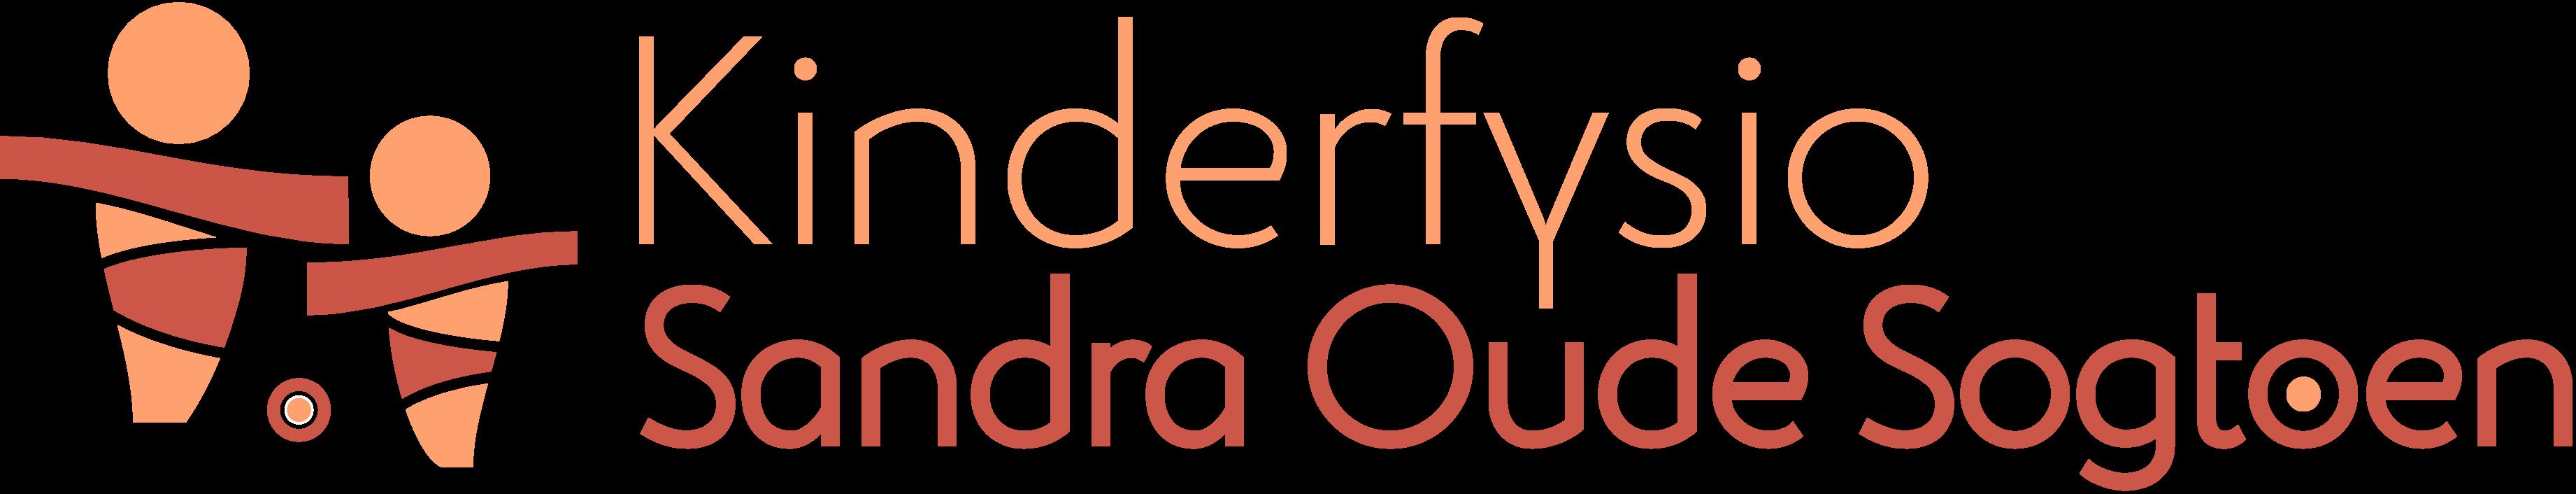 Sandra Oude Sogtoen Kinderfysiotherapie